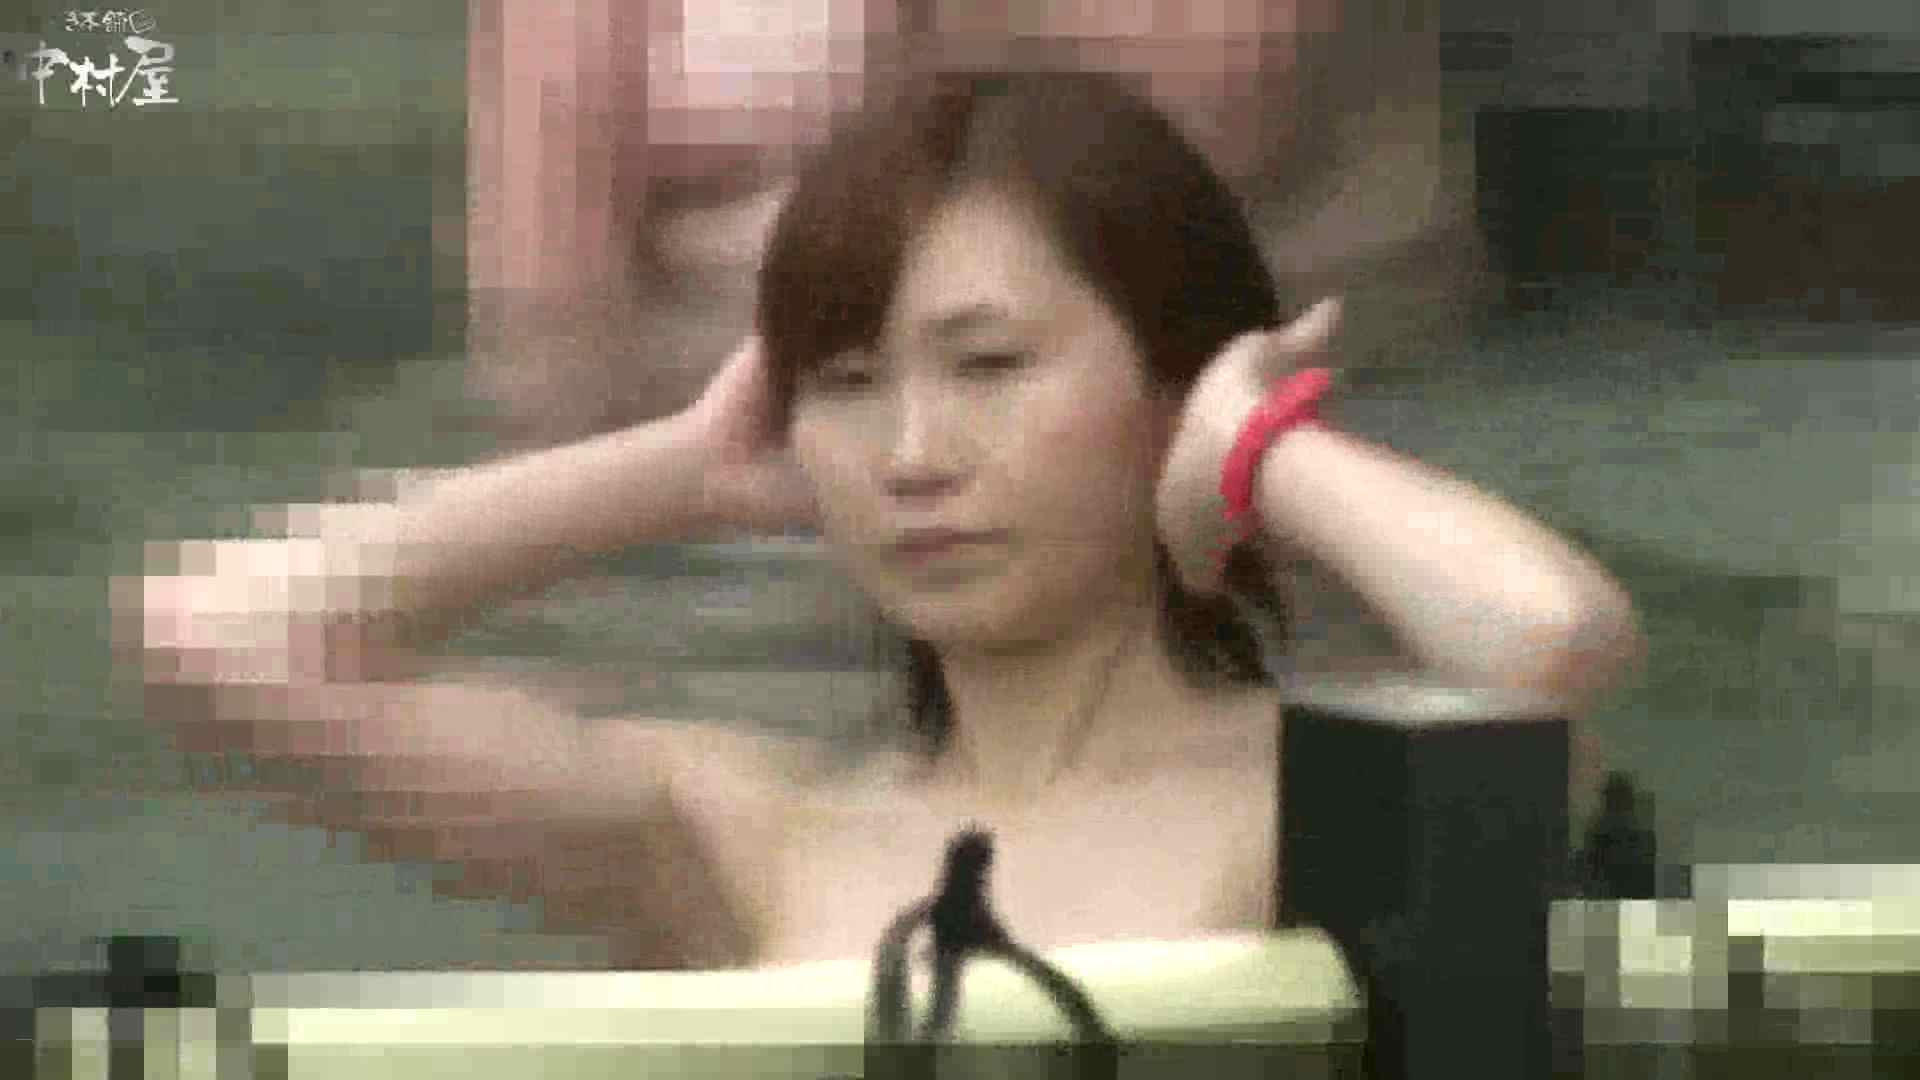 Aquaな露天風呂Vol.877潜入盗撮露天風呂十三判湯 其の二 0  106pic 48